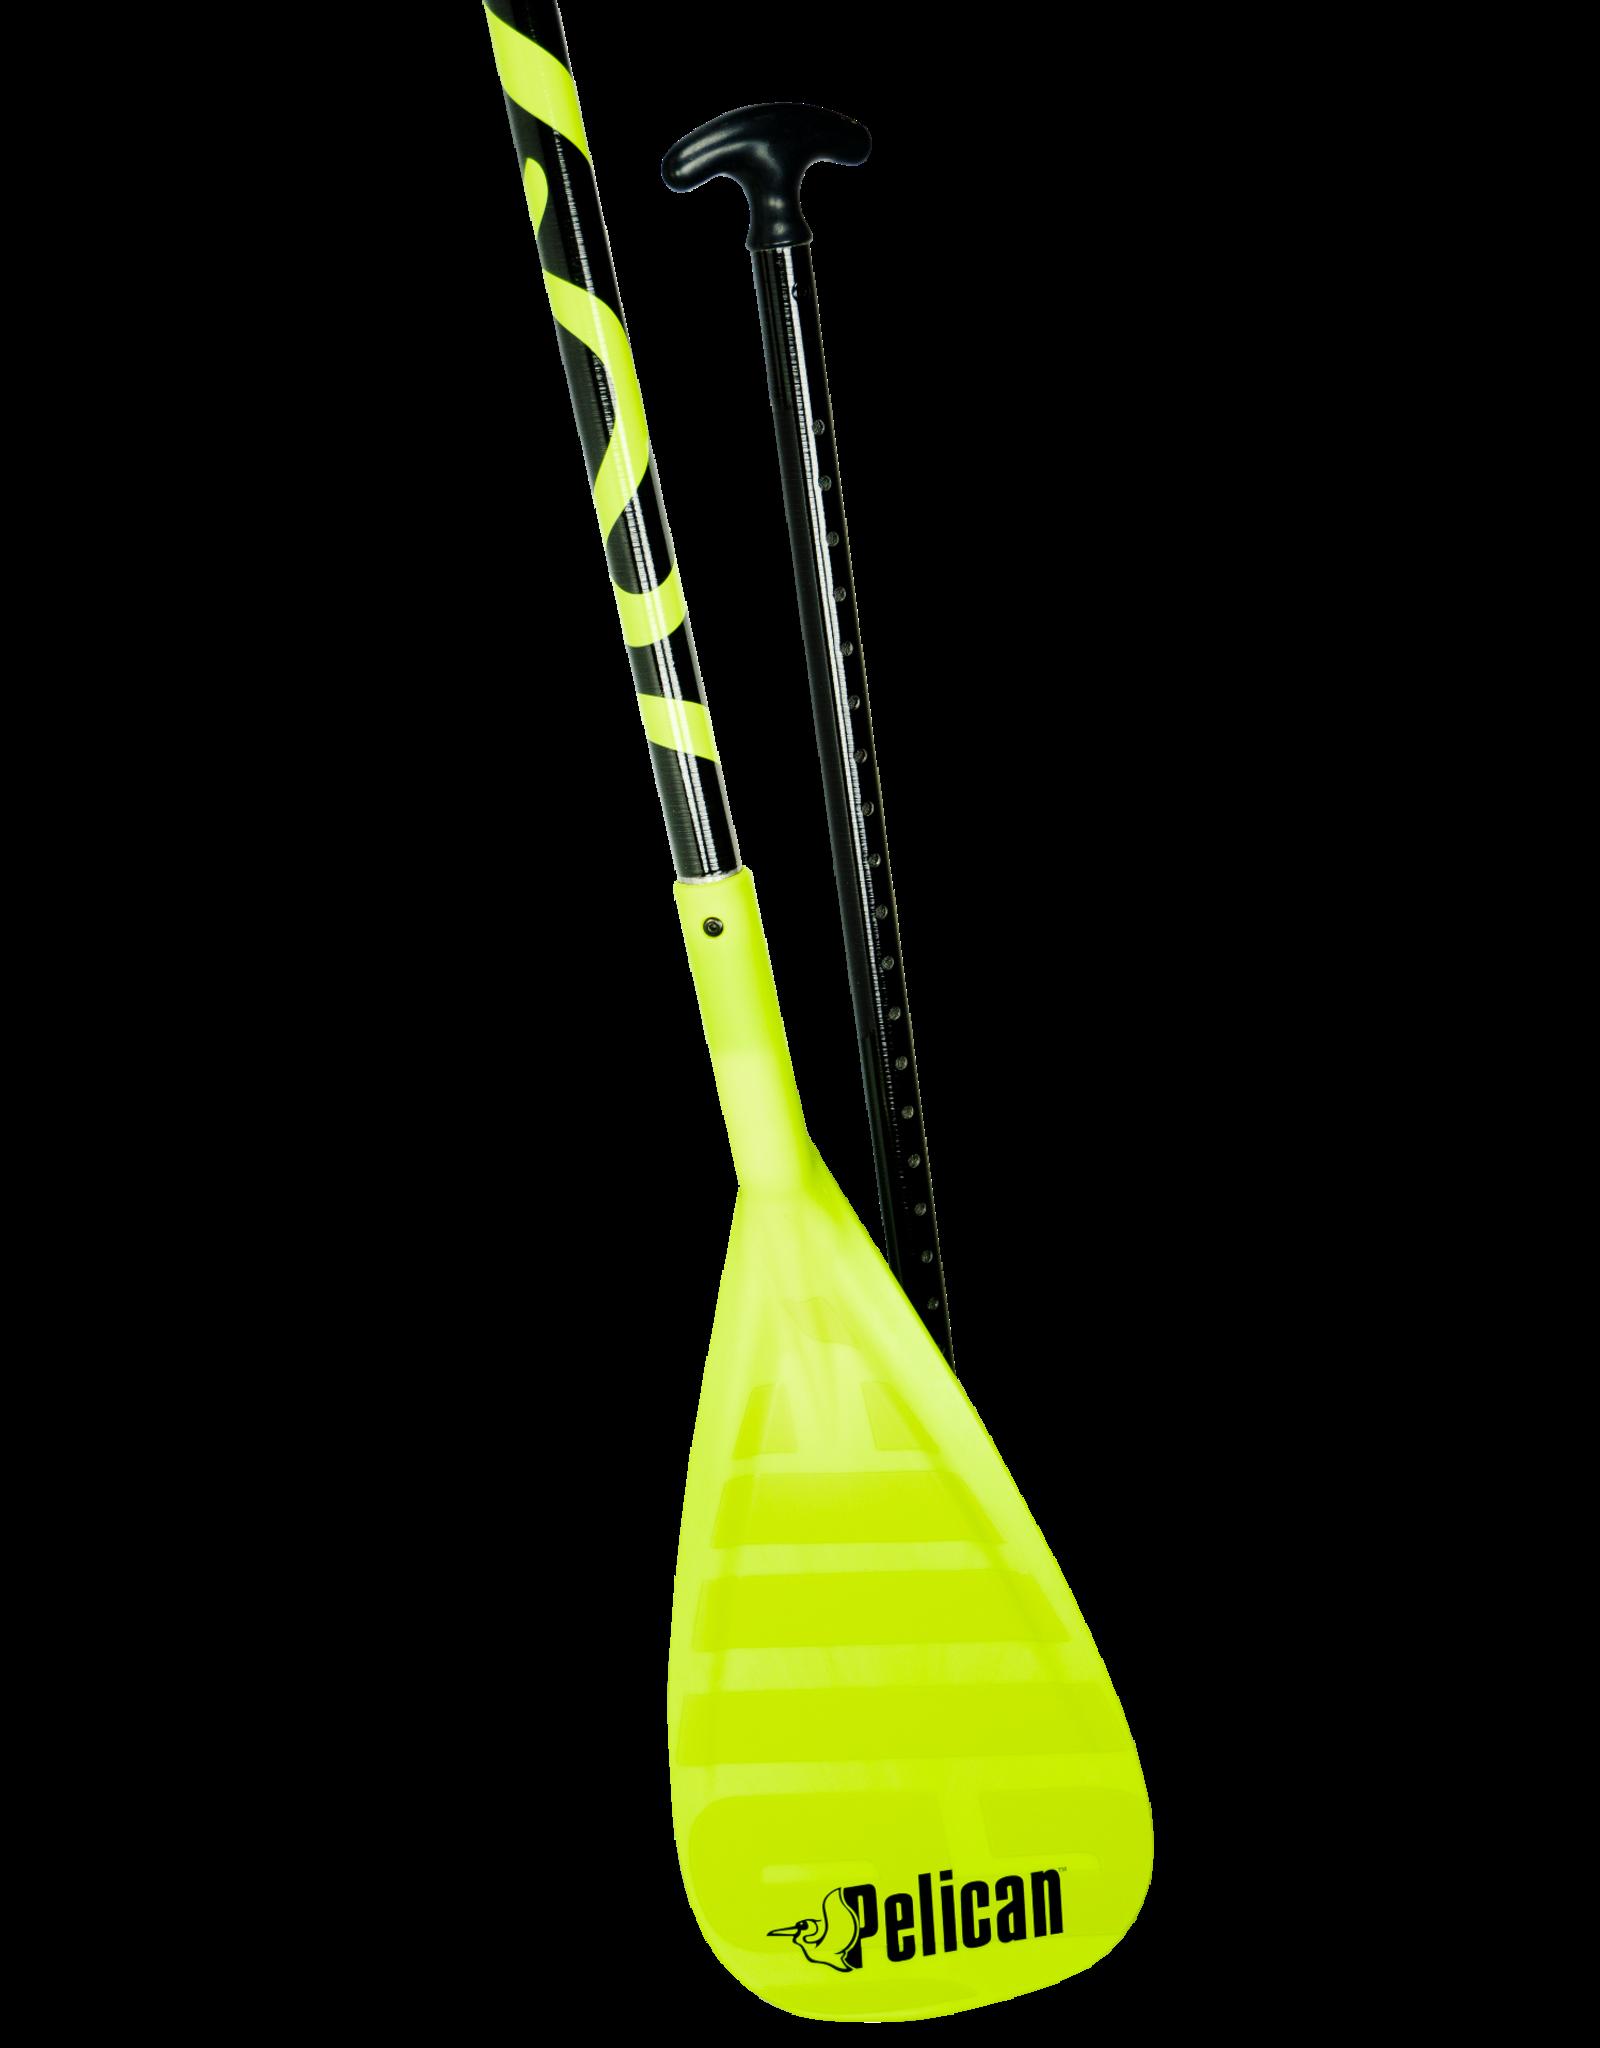 Pelican Pelican Adjustable Vate SUP Paddle in Yellow/green 178-221 cm